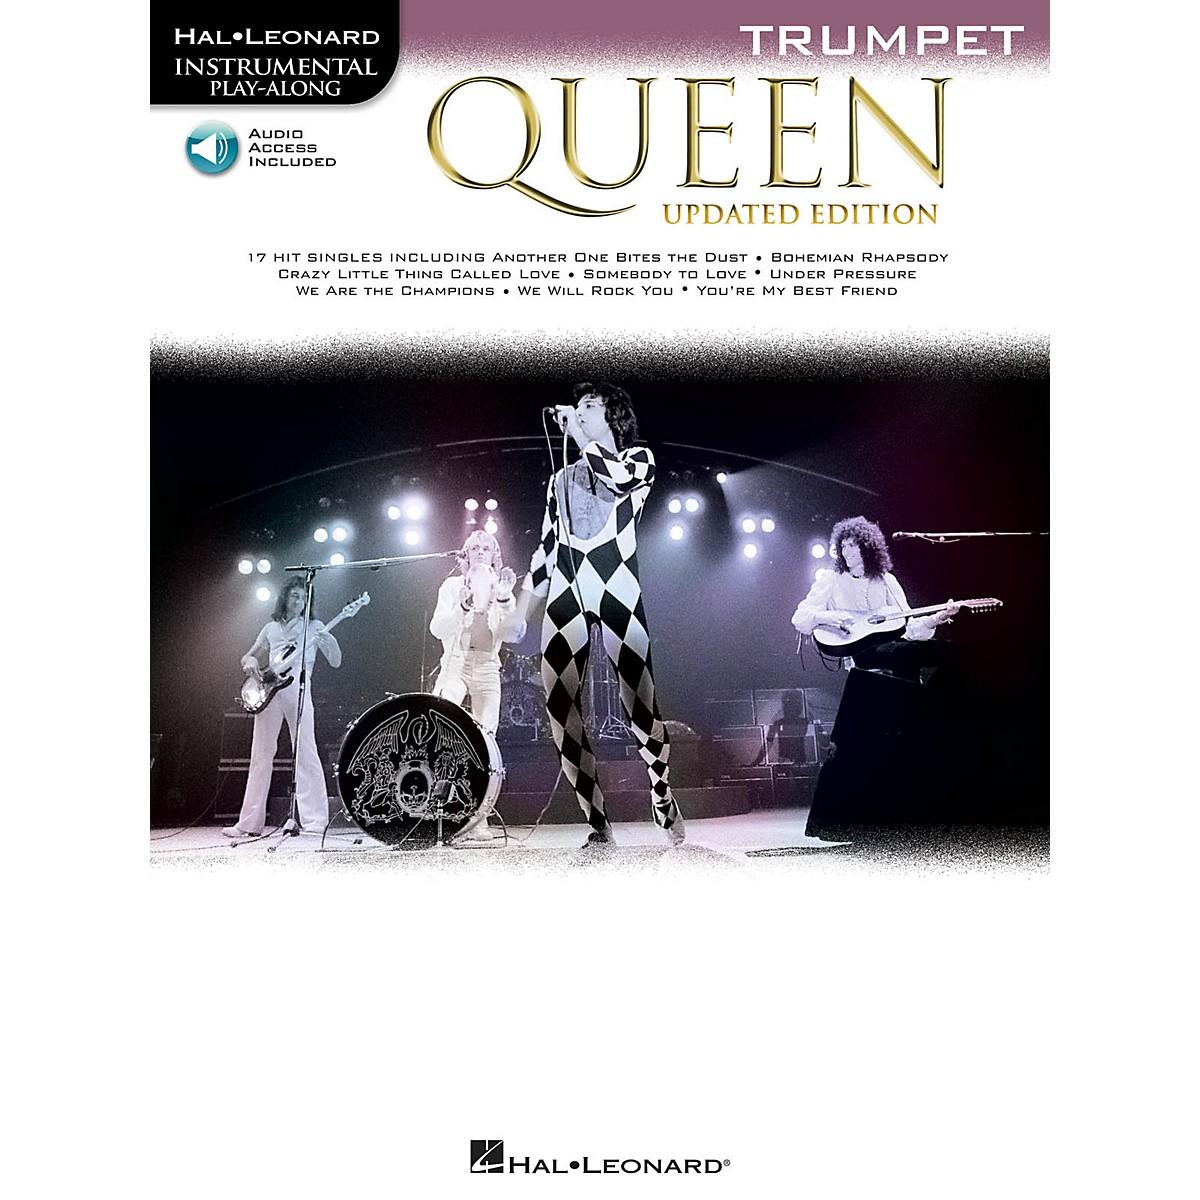 Hal Leonard Queen - Updated Edition Trumpet Instrumental Play-Along Songbook Book/Audio Online